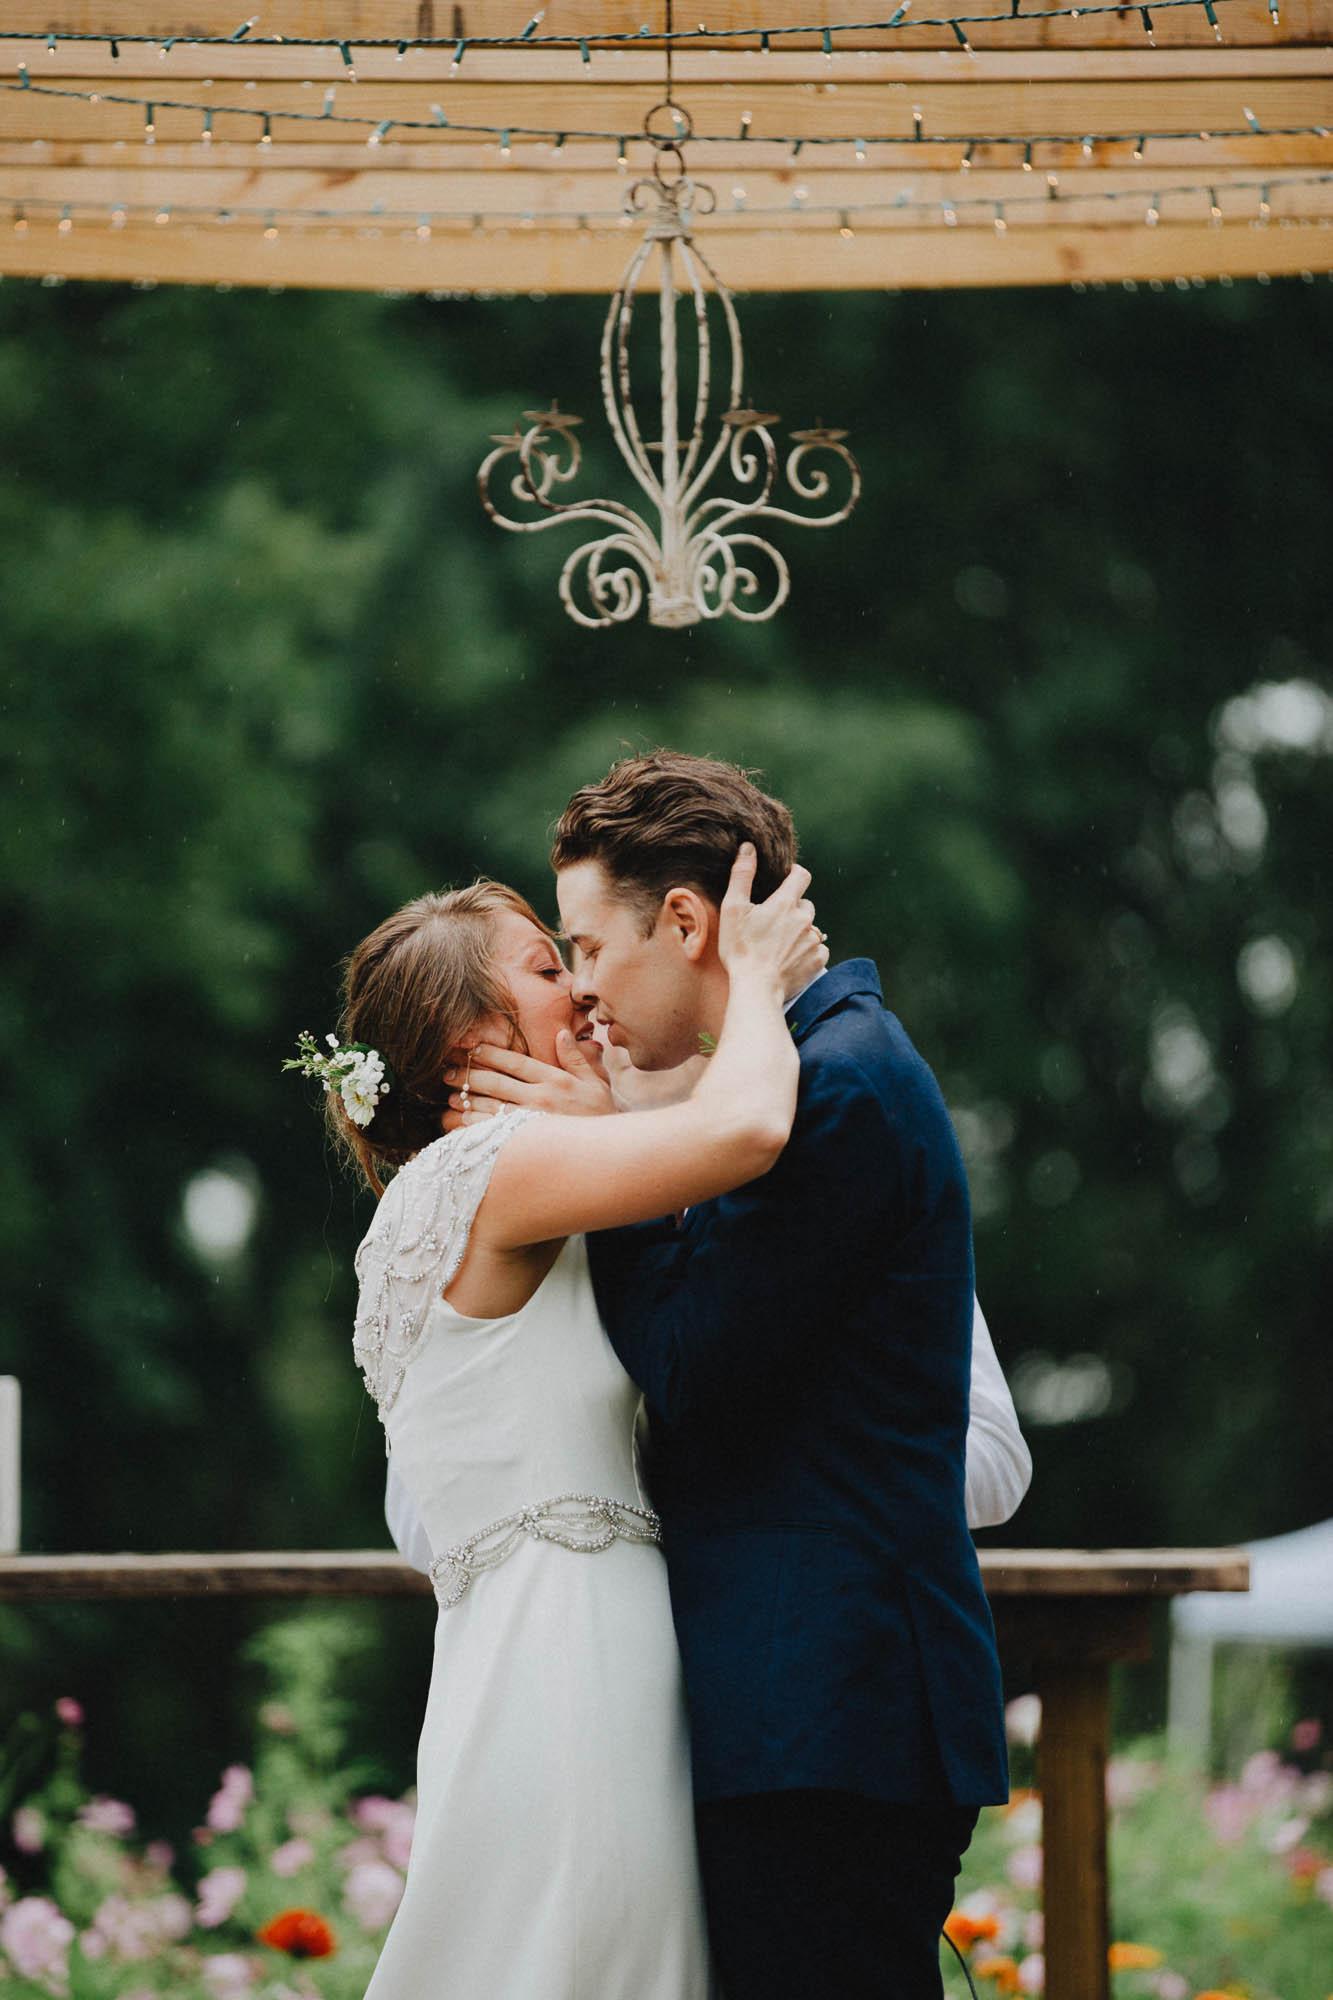 Leah-Graham-Michigan-Outdoor-DIY-Wedding-054@2x.jpg